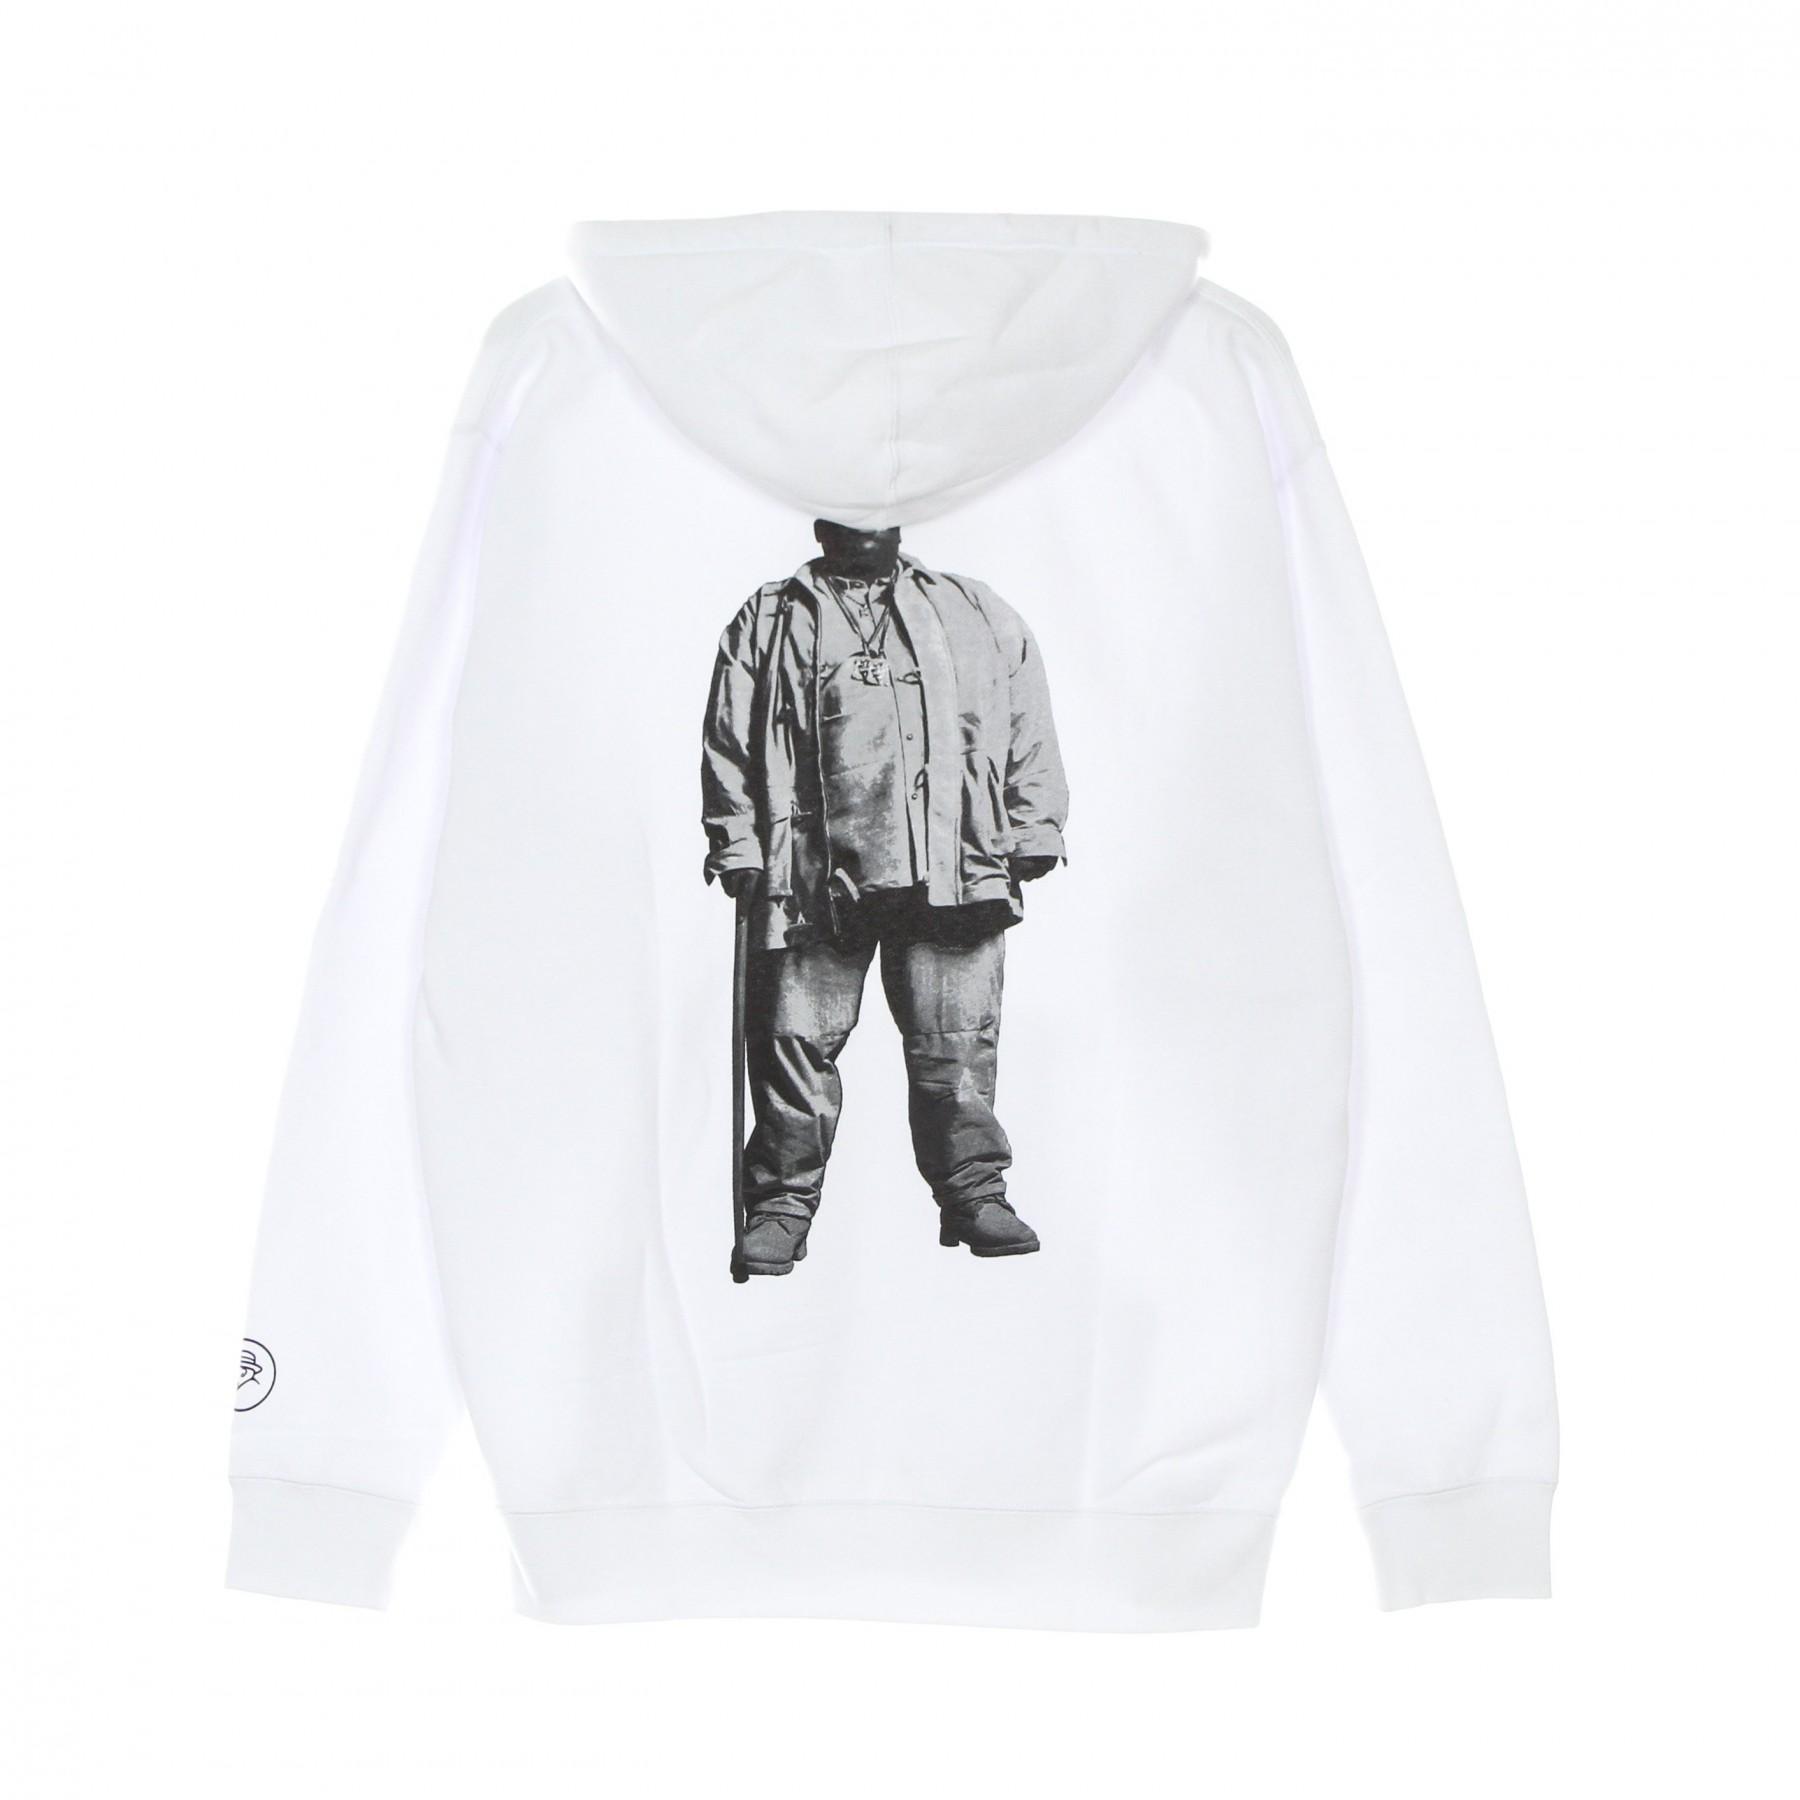 felpa cappuccio uomo legacy reborn hoodie x notorious b.i.g. XL